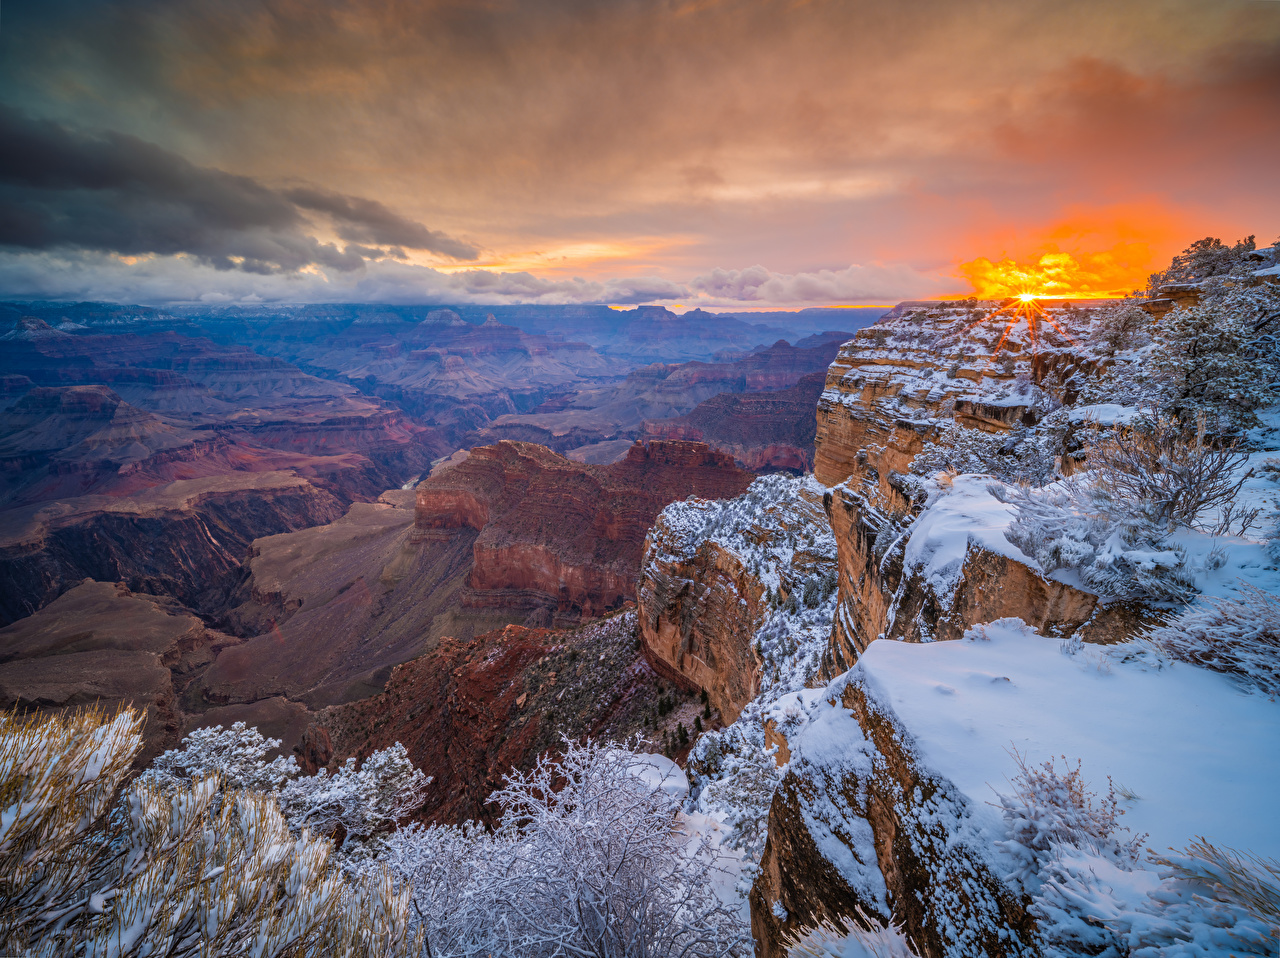 Image Grand Canyon Park USA Arizona Rock Nature canyons park Sunrises and sunsets Crag Cliff Canyon Parks sunrise and sunset